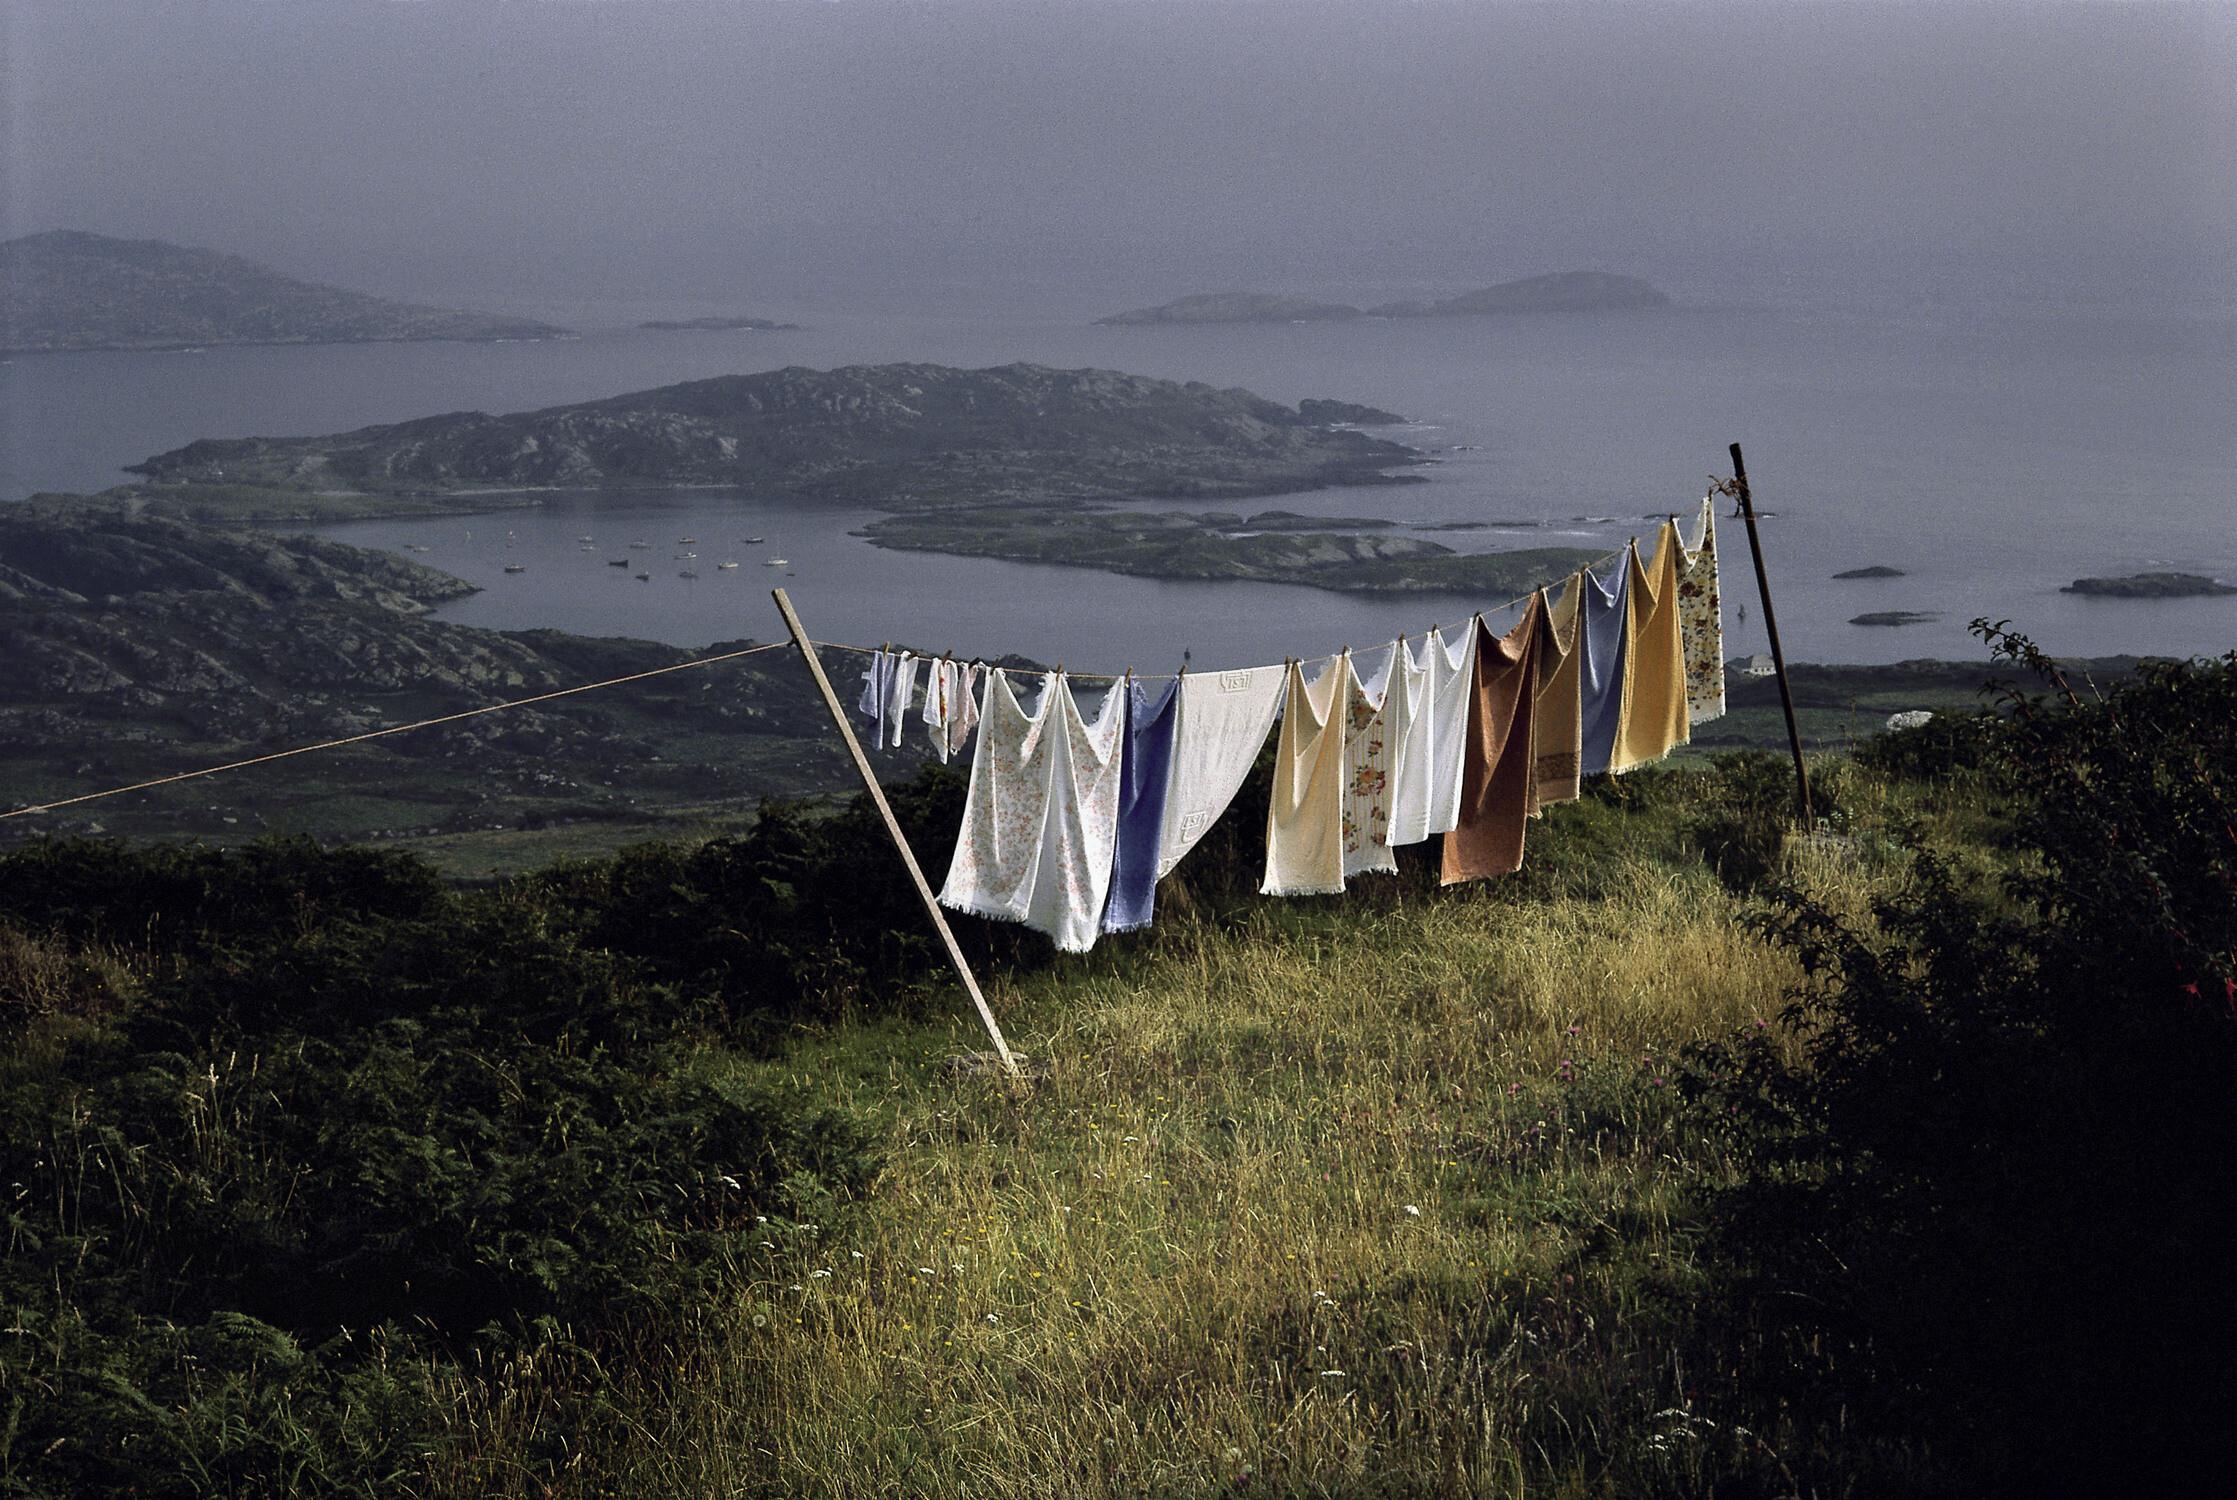 Графство Керри, Ирландия, 1988. Фотограф Гарри Груйер